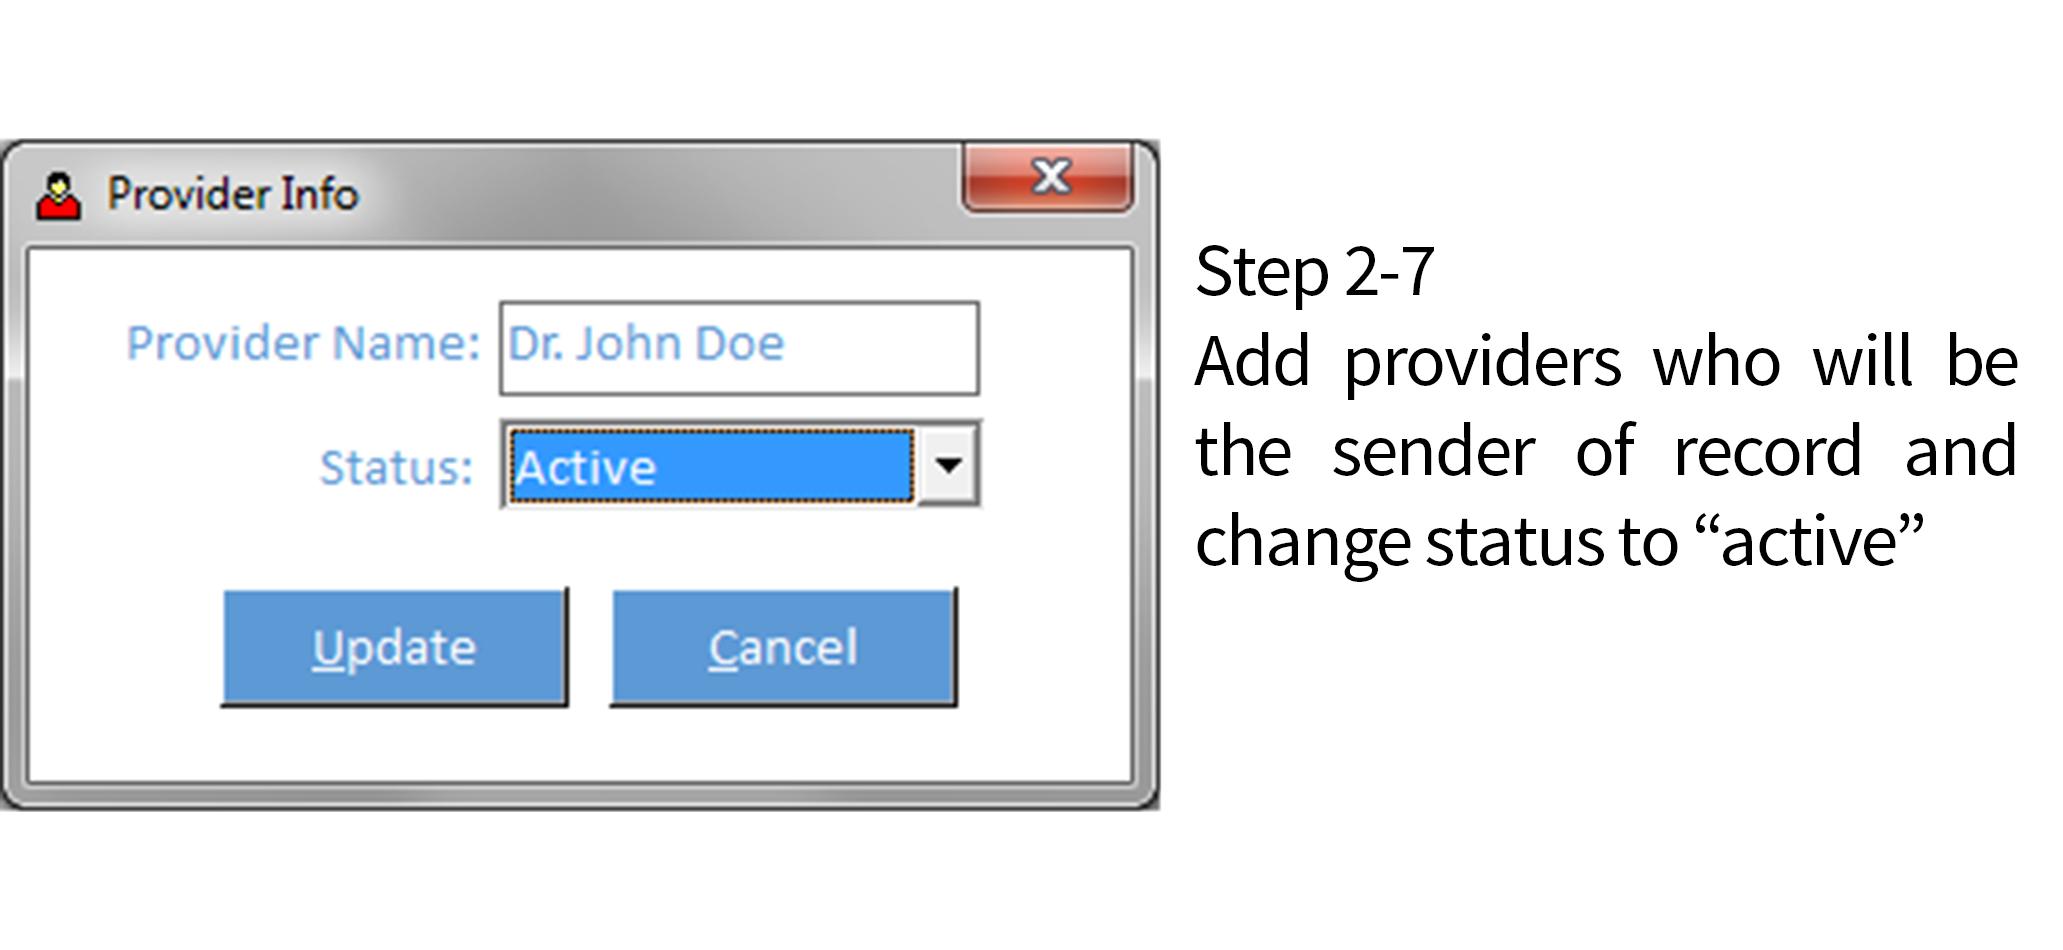 PartSetUp_S2_7_add_provider_b